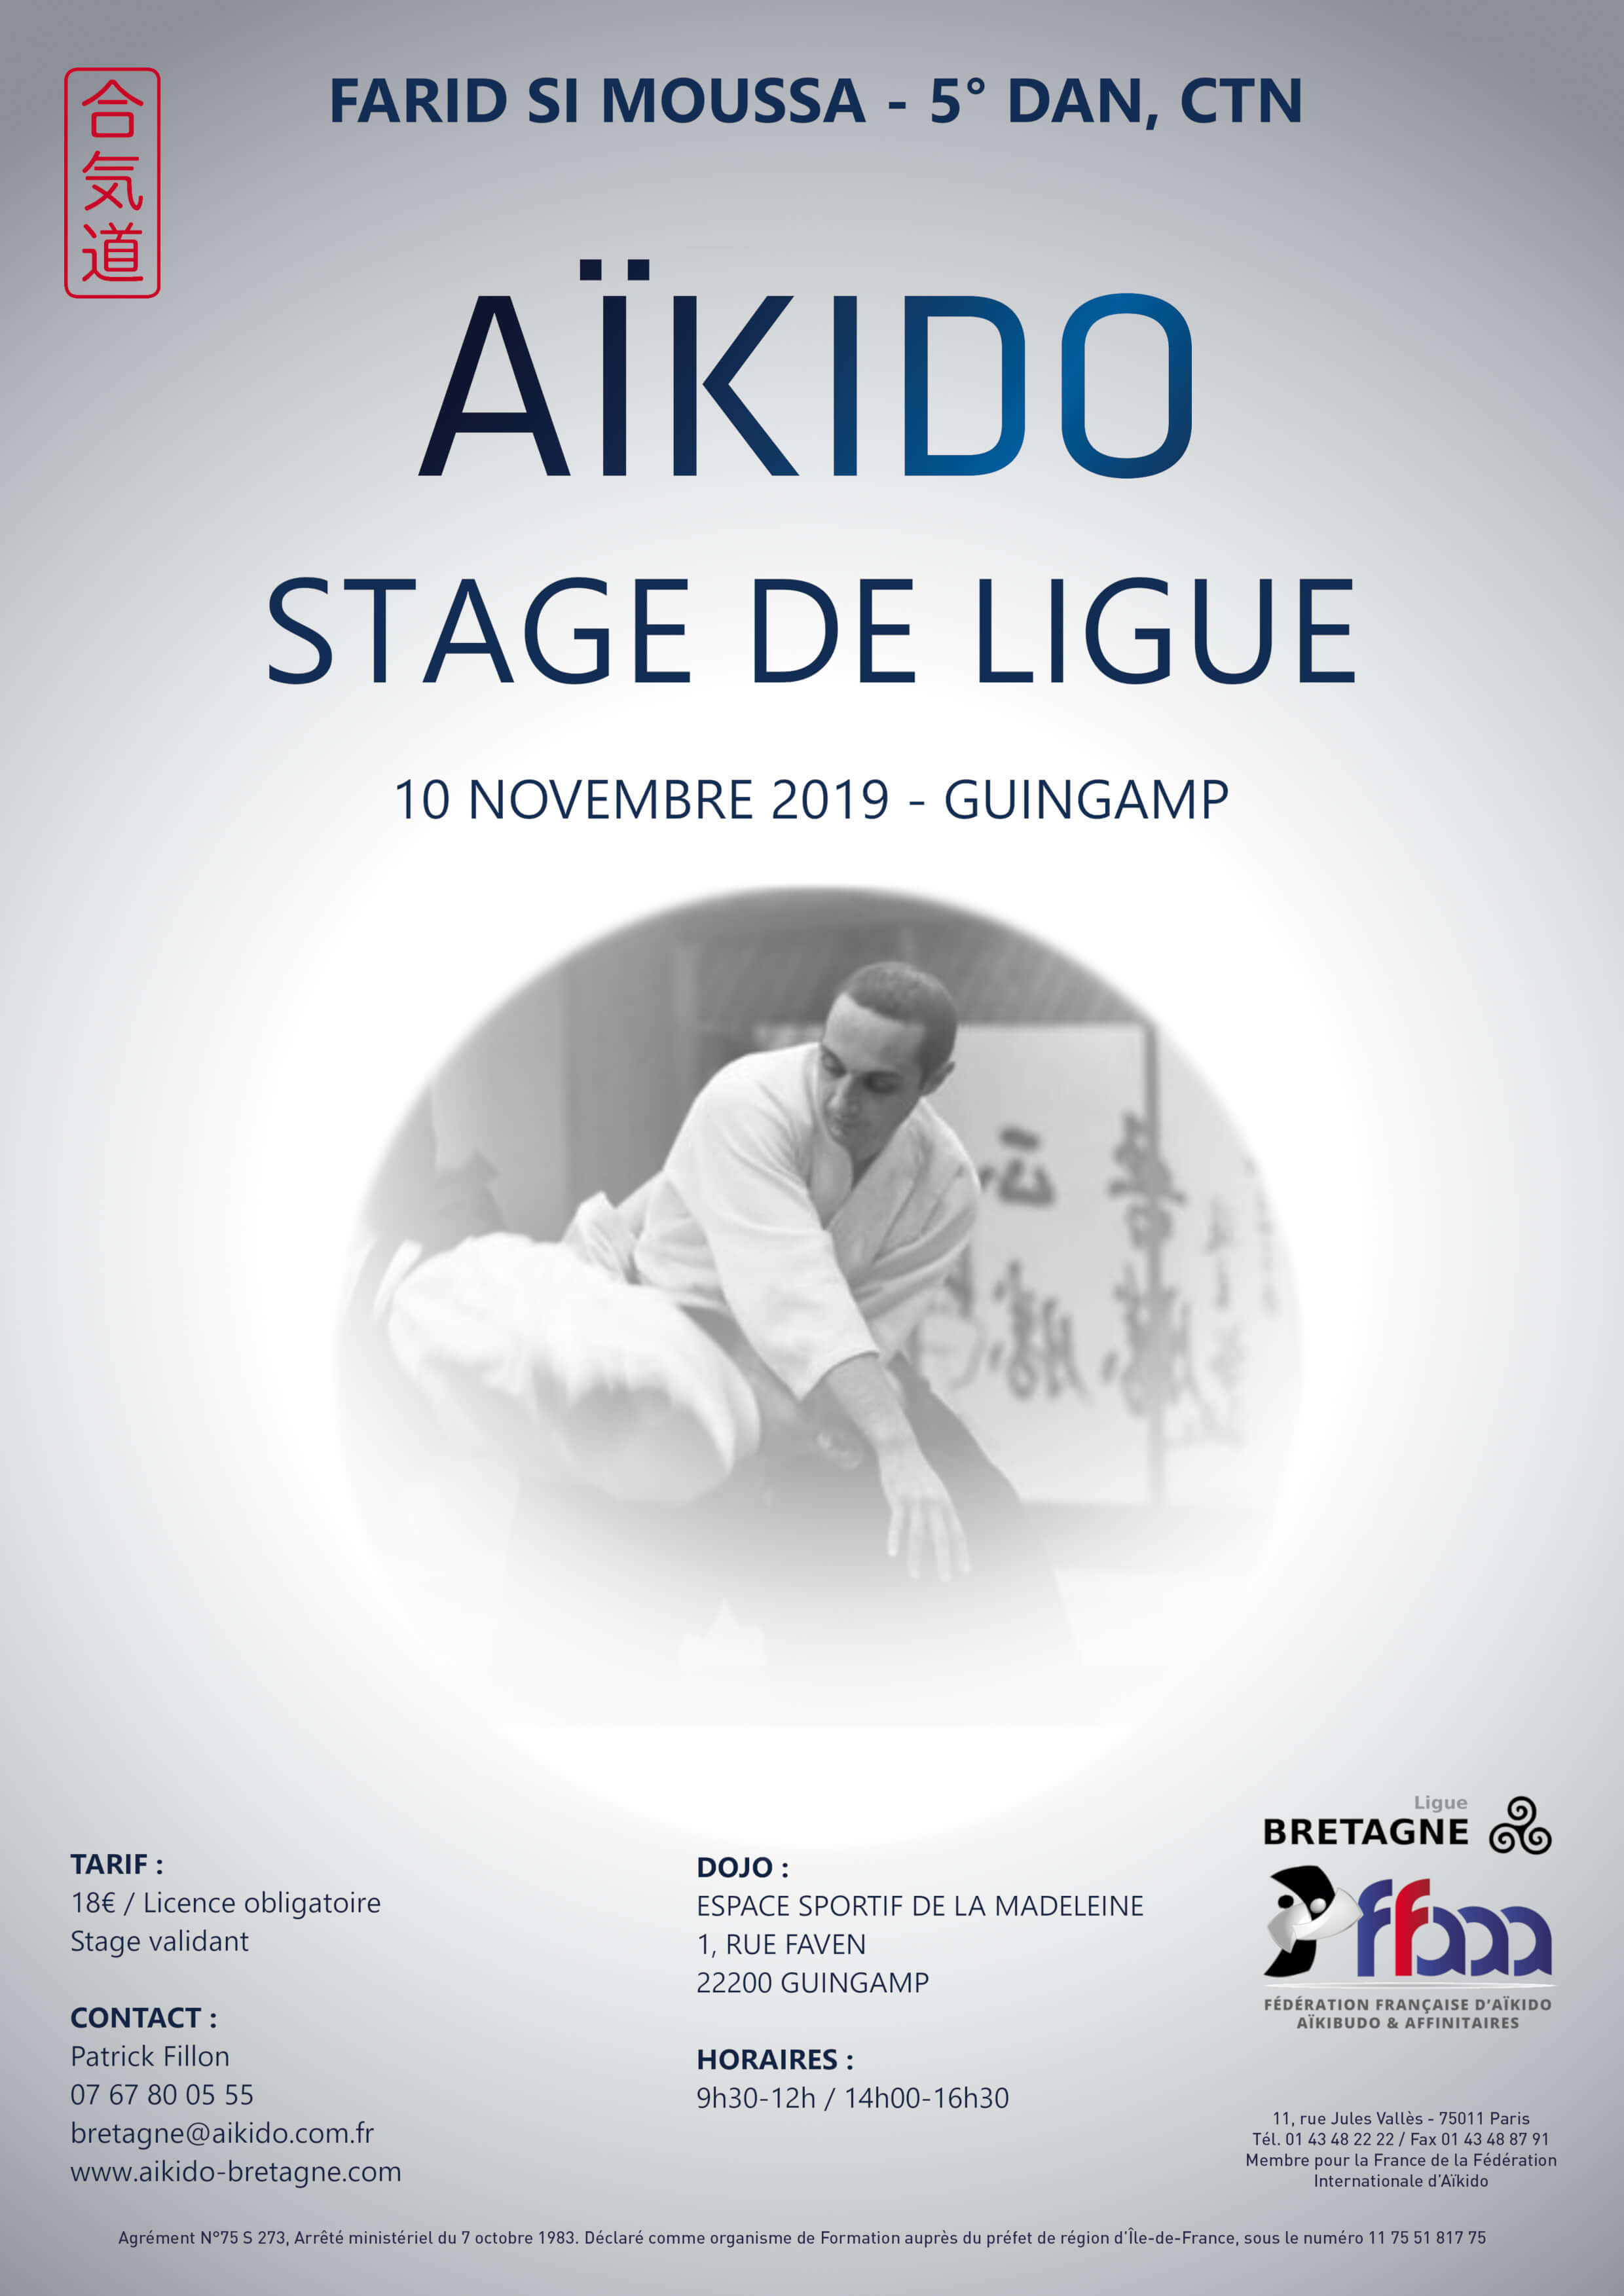 https://www.aikido-bretagne.com/wp-content/uploads/2019/10/Affiche-Stage-Ligue-Guingamp-Farid-Si-Moussa-10-nov-2019-a4-comp